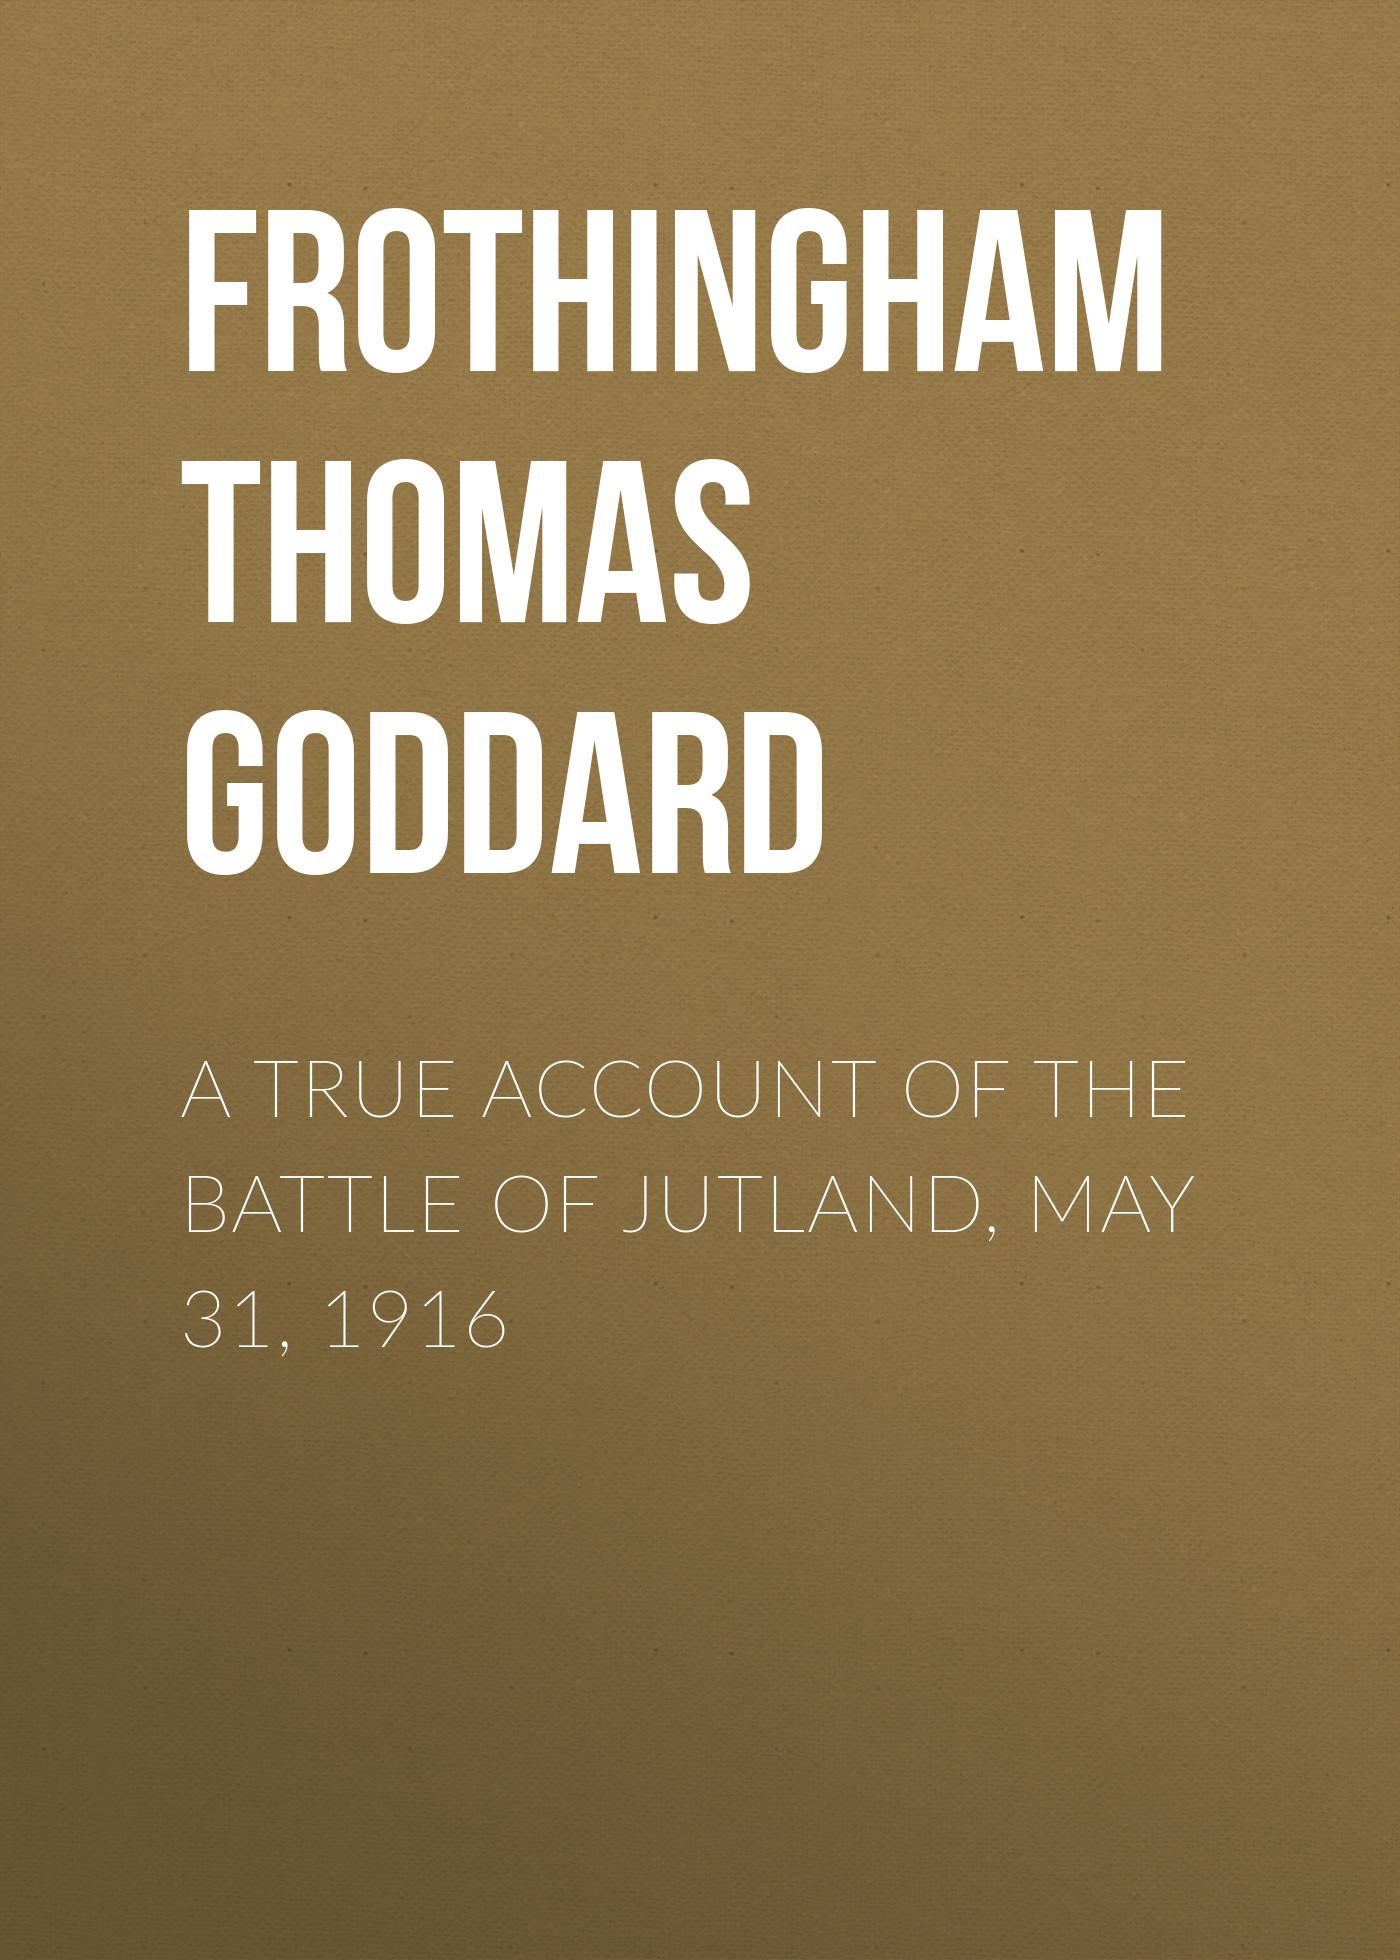 лучшая цена Frothingham Thomas Goddard A True Account of the Battle of Jutland, May 31, 1916